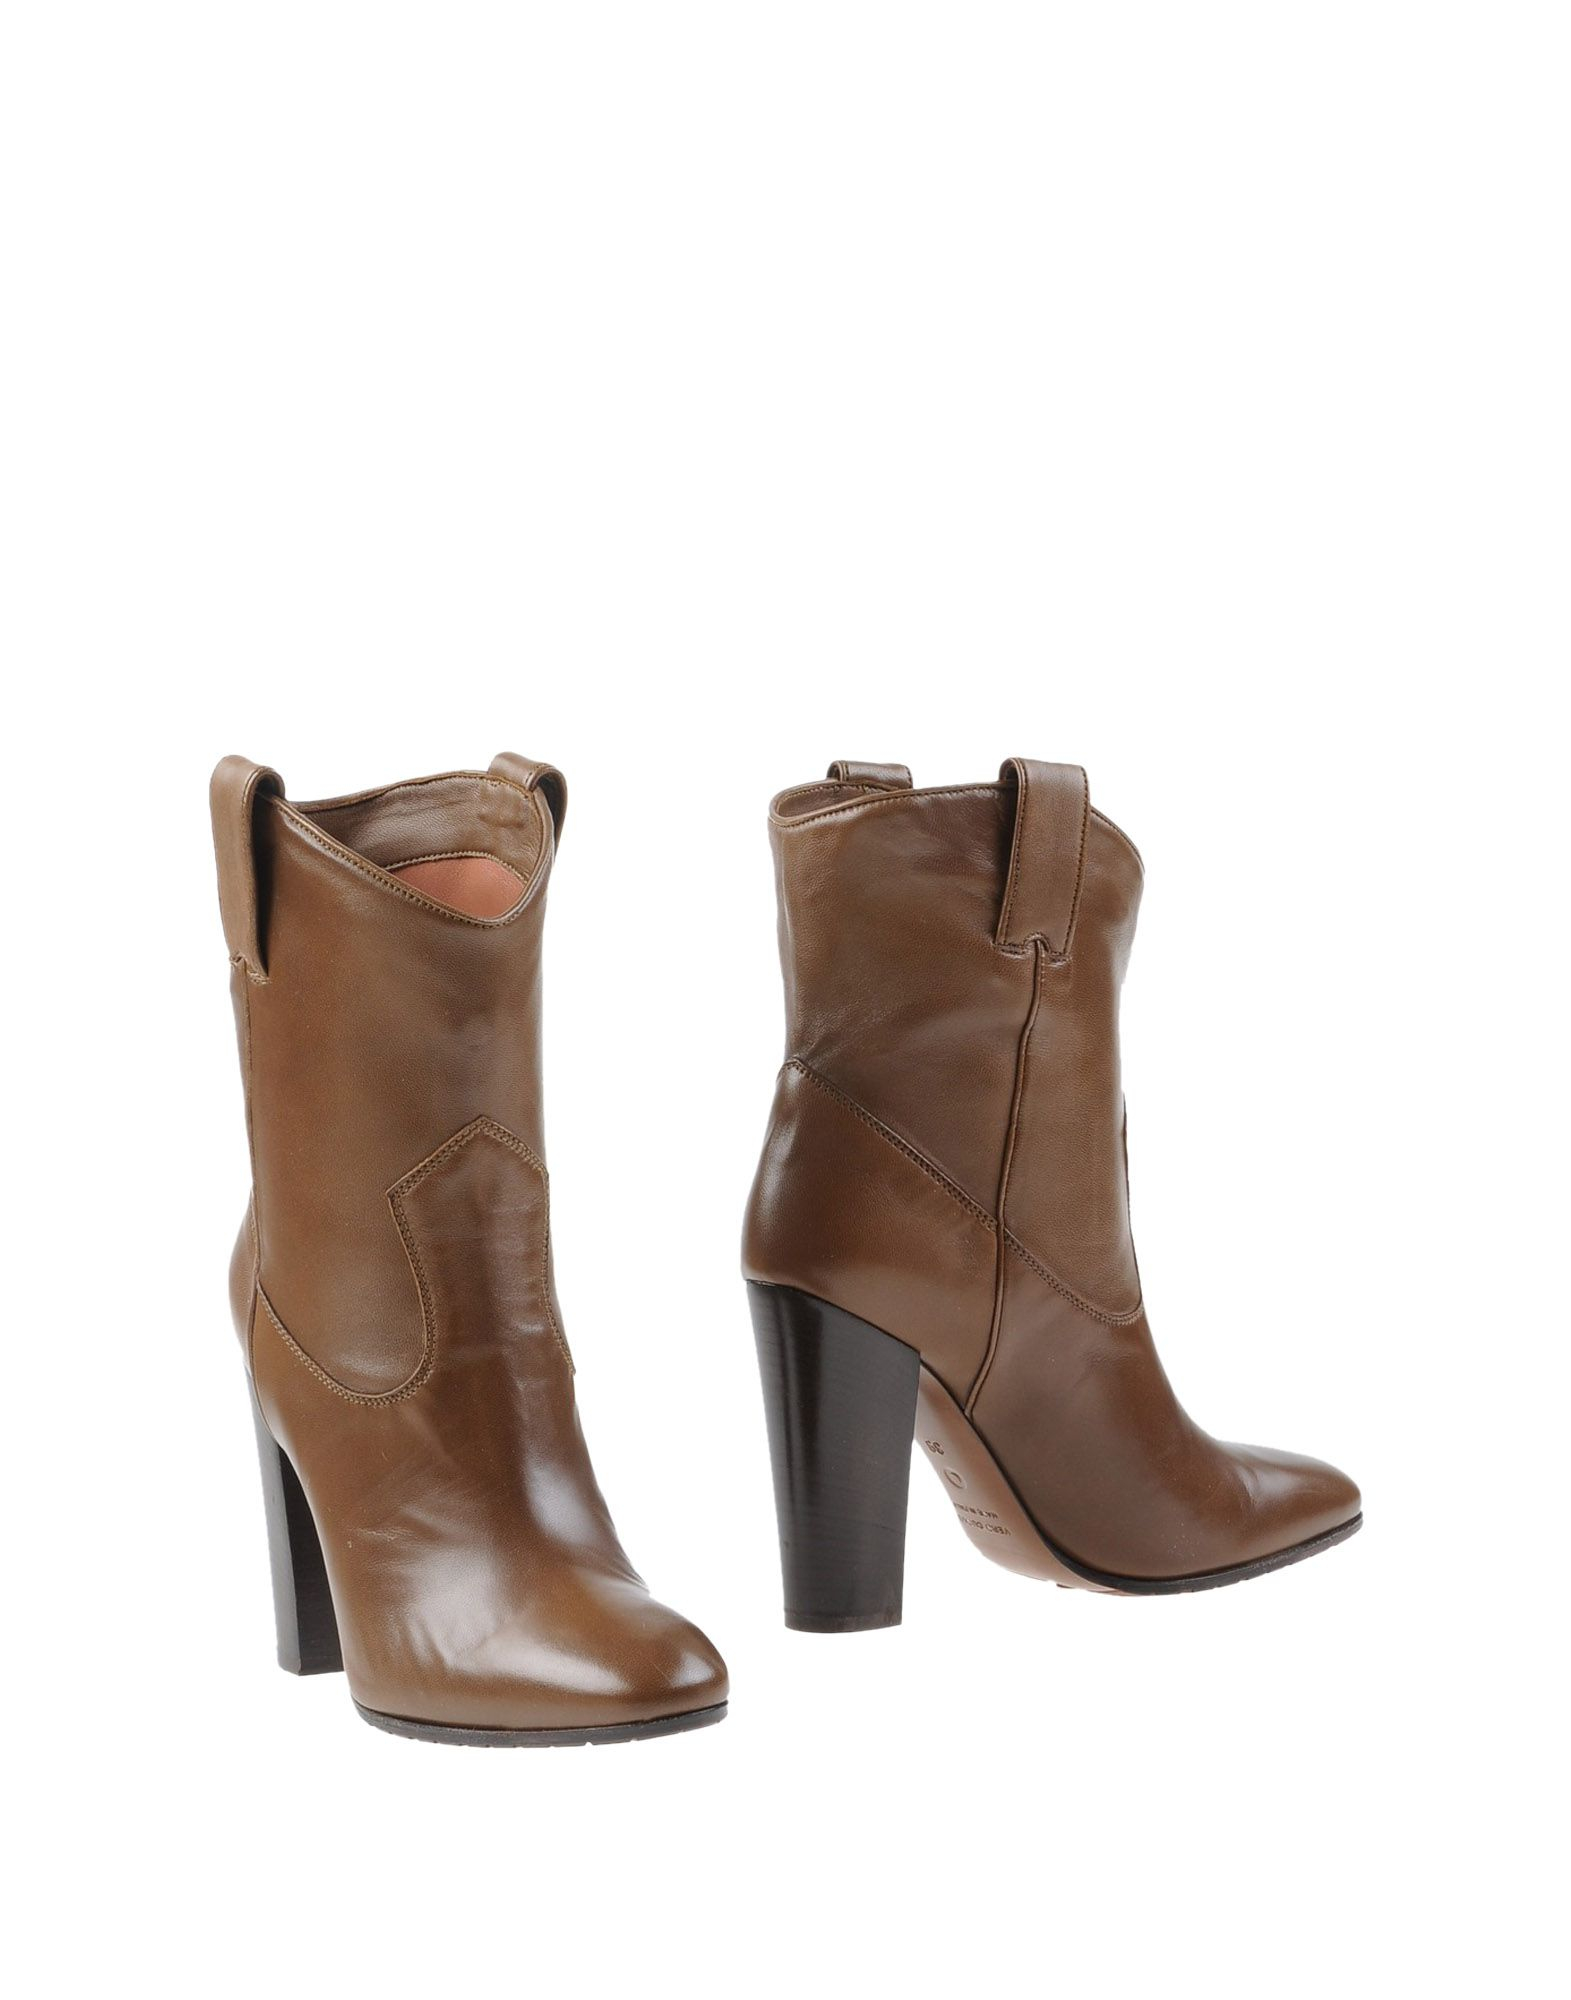 lyst l 39 autre chose ankle boots in brown. Black Bedroom Furniture Sets. Home Design Ideas